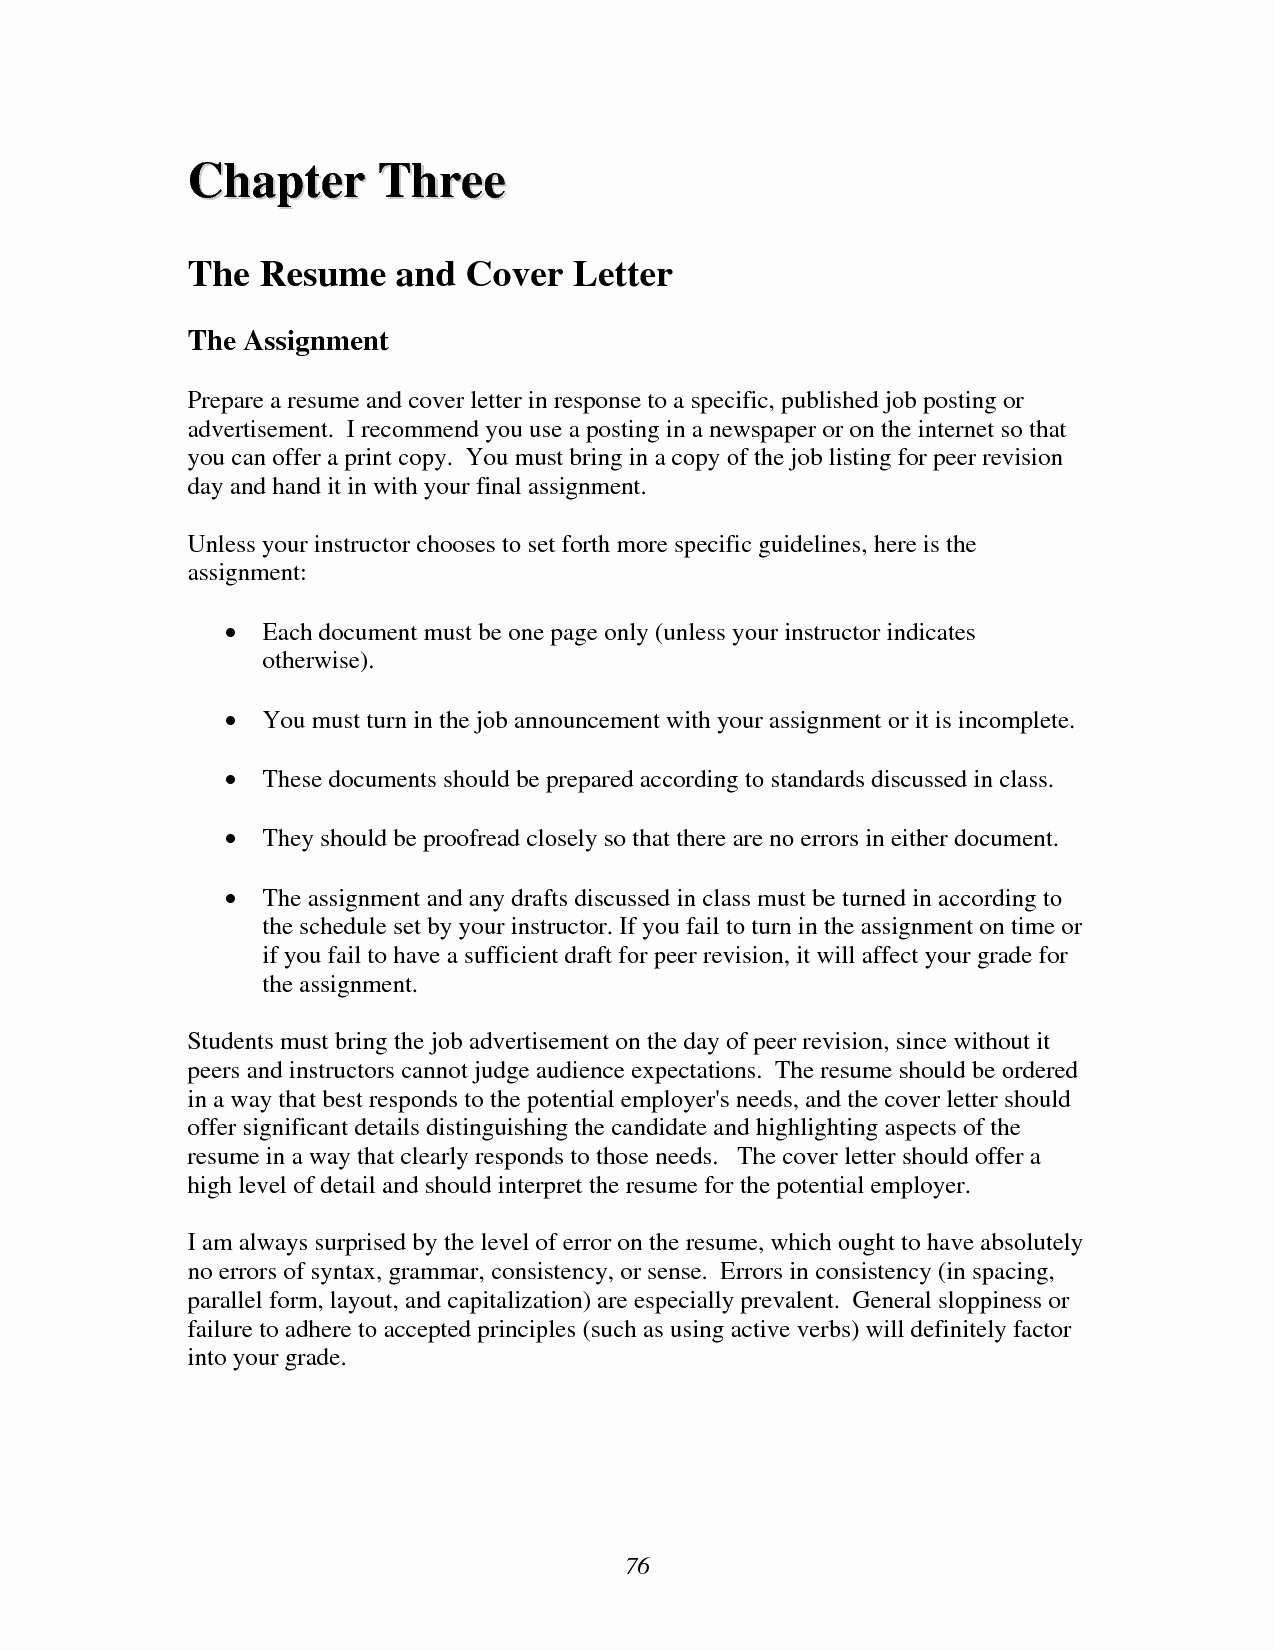 Formal Offer Letter Template - formal Job Fer Letter Best Job Fer Letter Template Us Copy Od